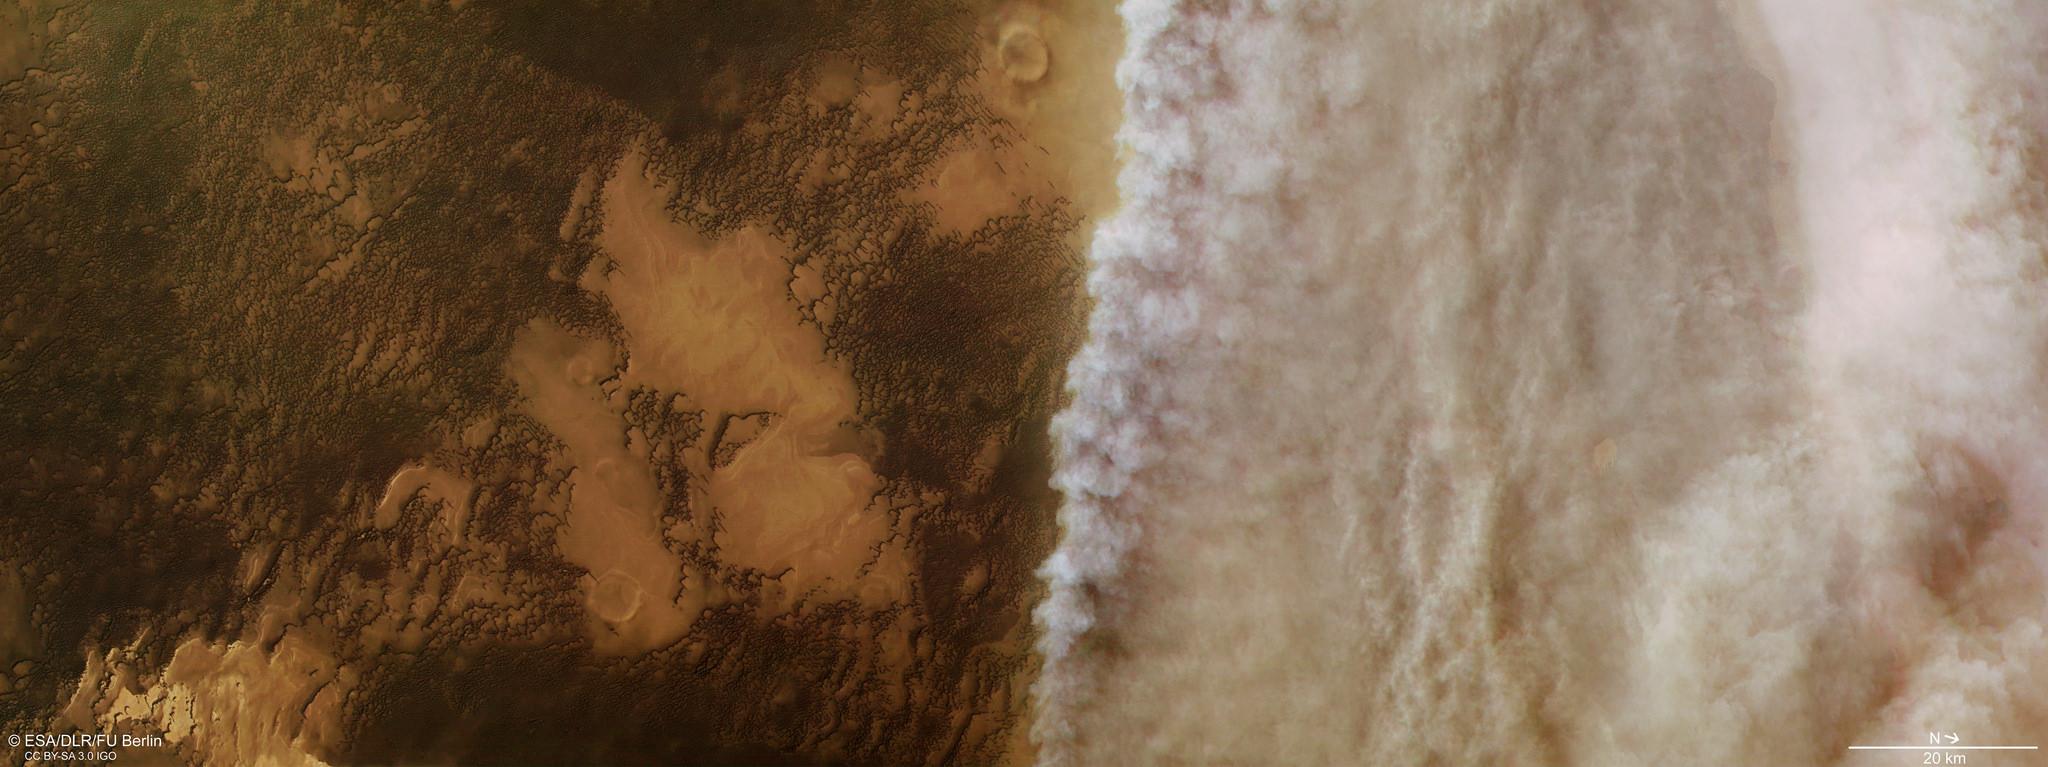 Mars-Dust-Storm